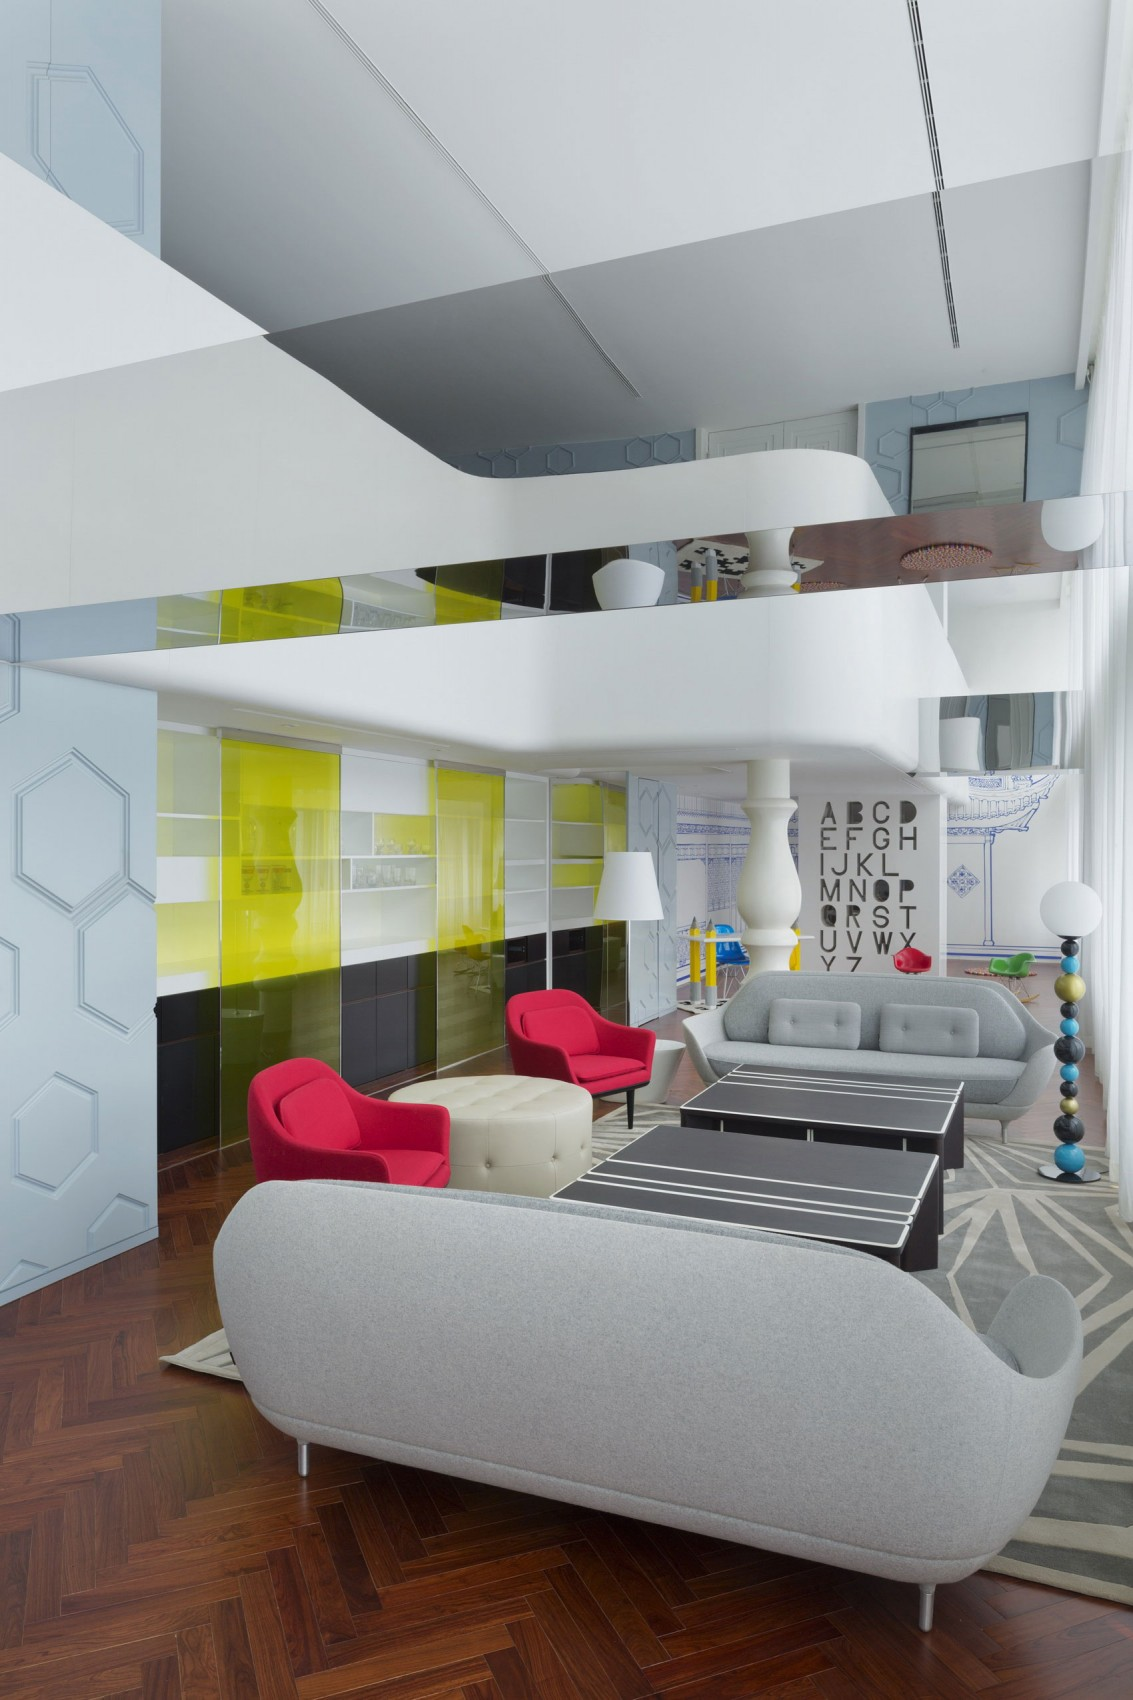 Appartement chinois d co color e salon for Deco coloree salon